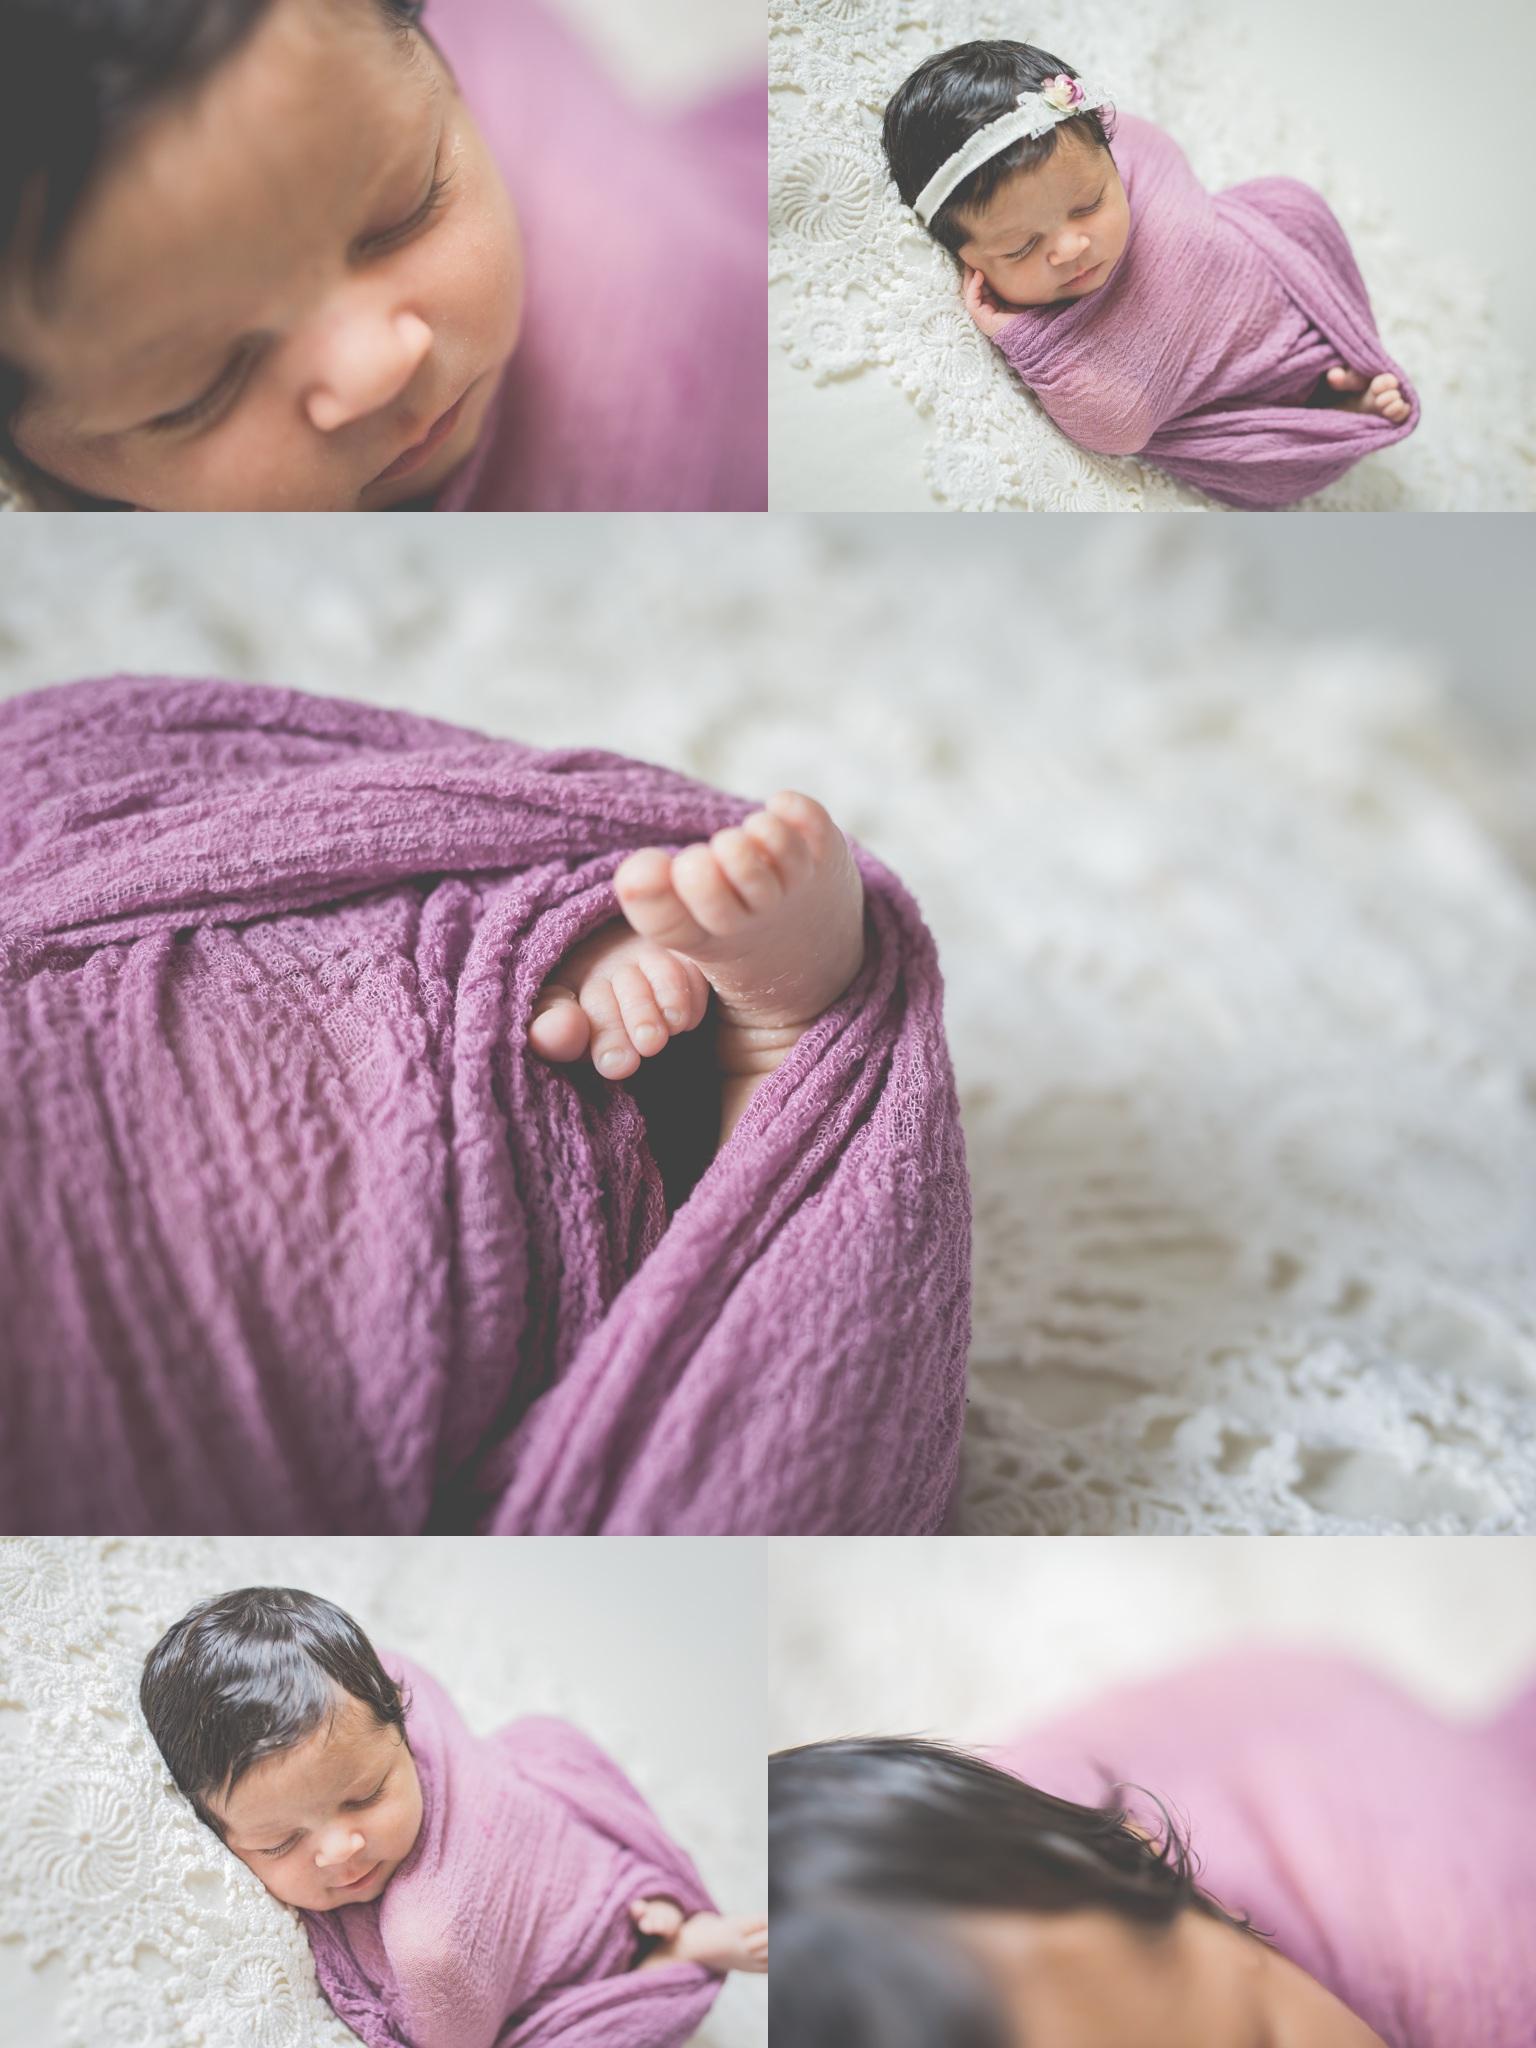 2017-01-25-newborn-baby-girl-camdenton-missouri-lake-ozarks-photographer.jpg